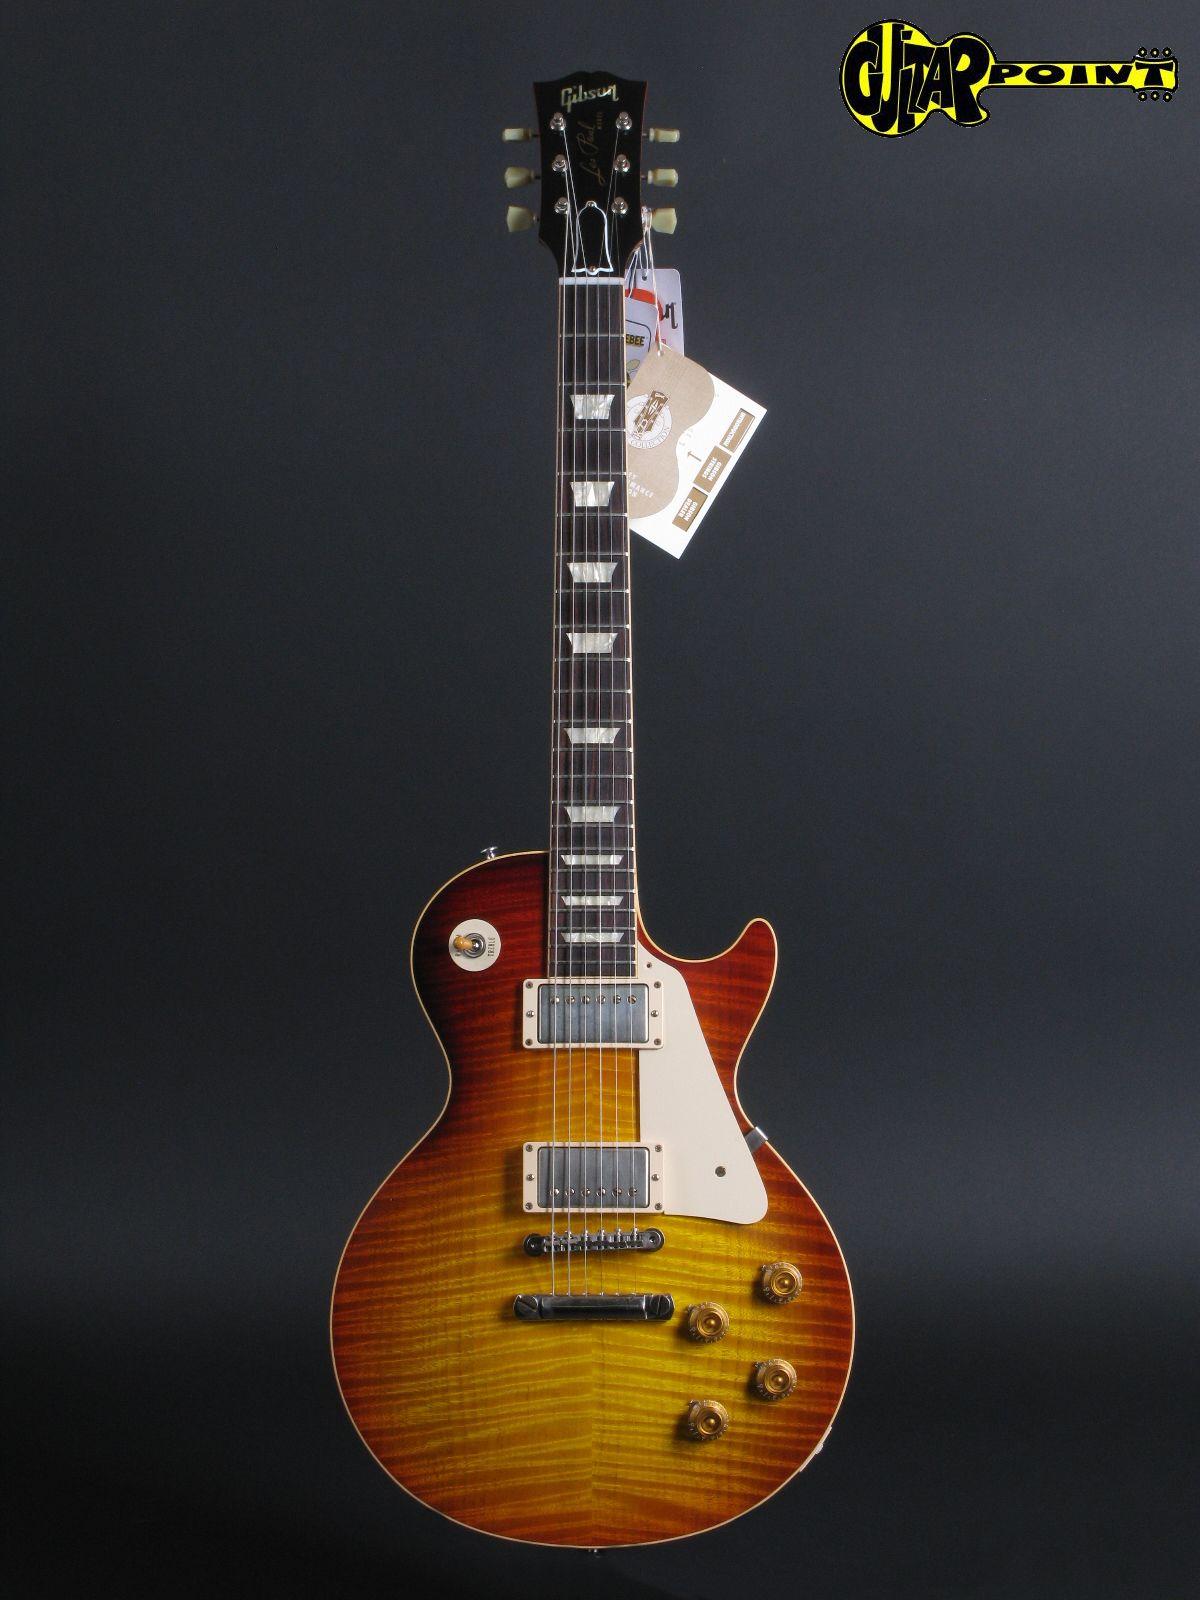 gibson 1959 les paul reissue 2013 specs 2012 bloomfield burst guitar for sale guitarpoint. Black Bedroom Furniture Sets. Home Design Ideas